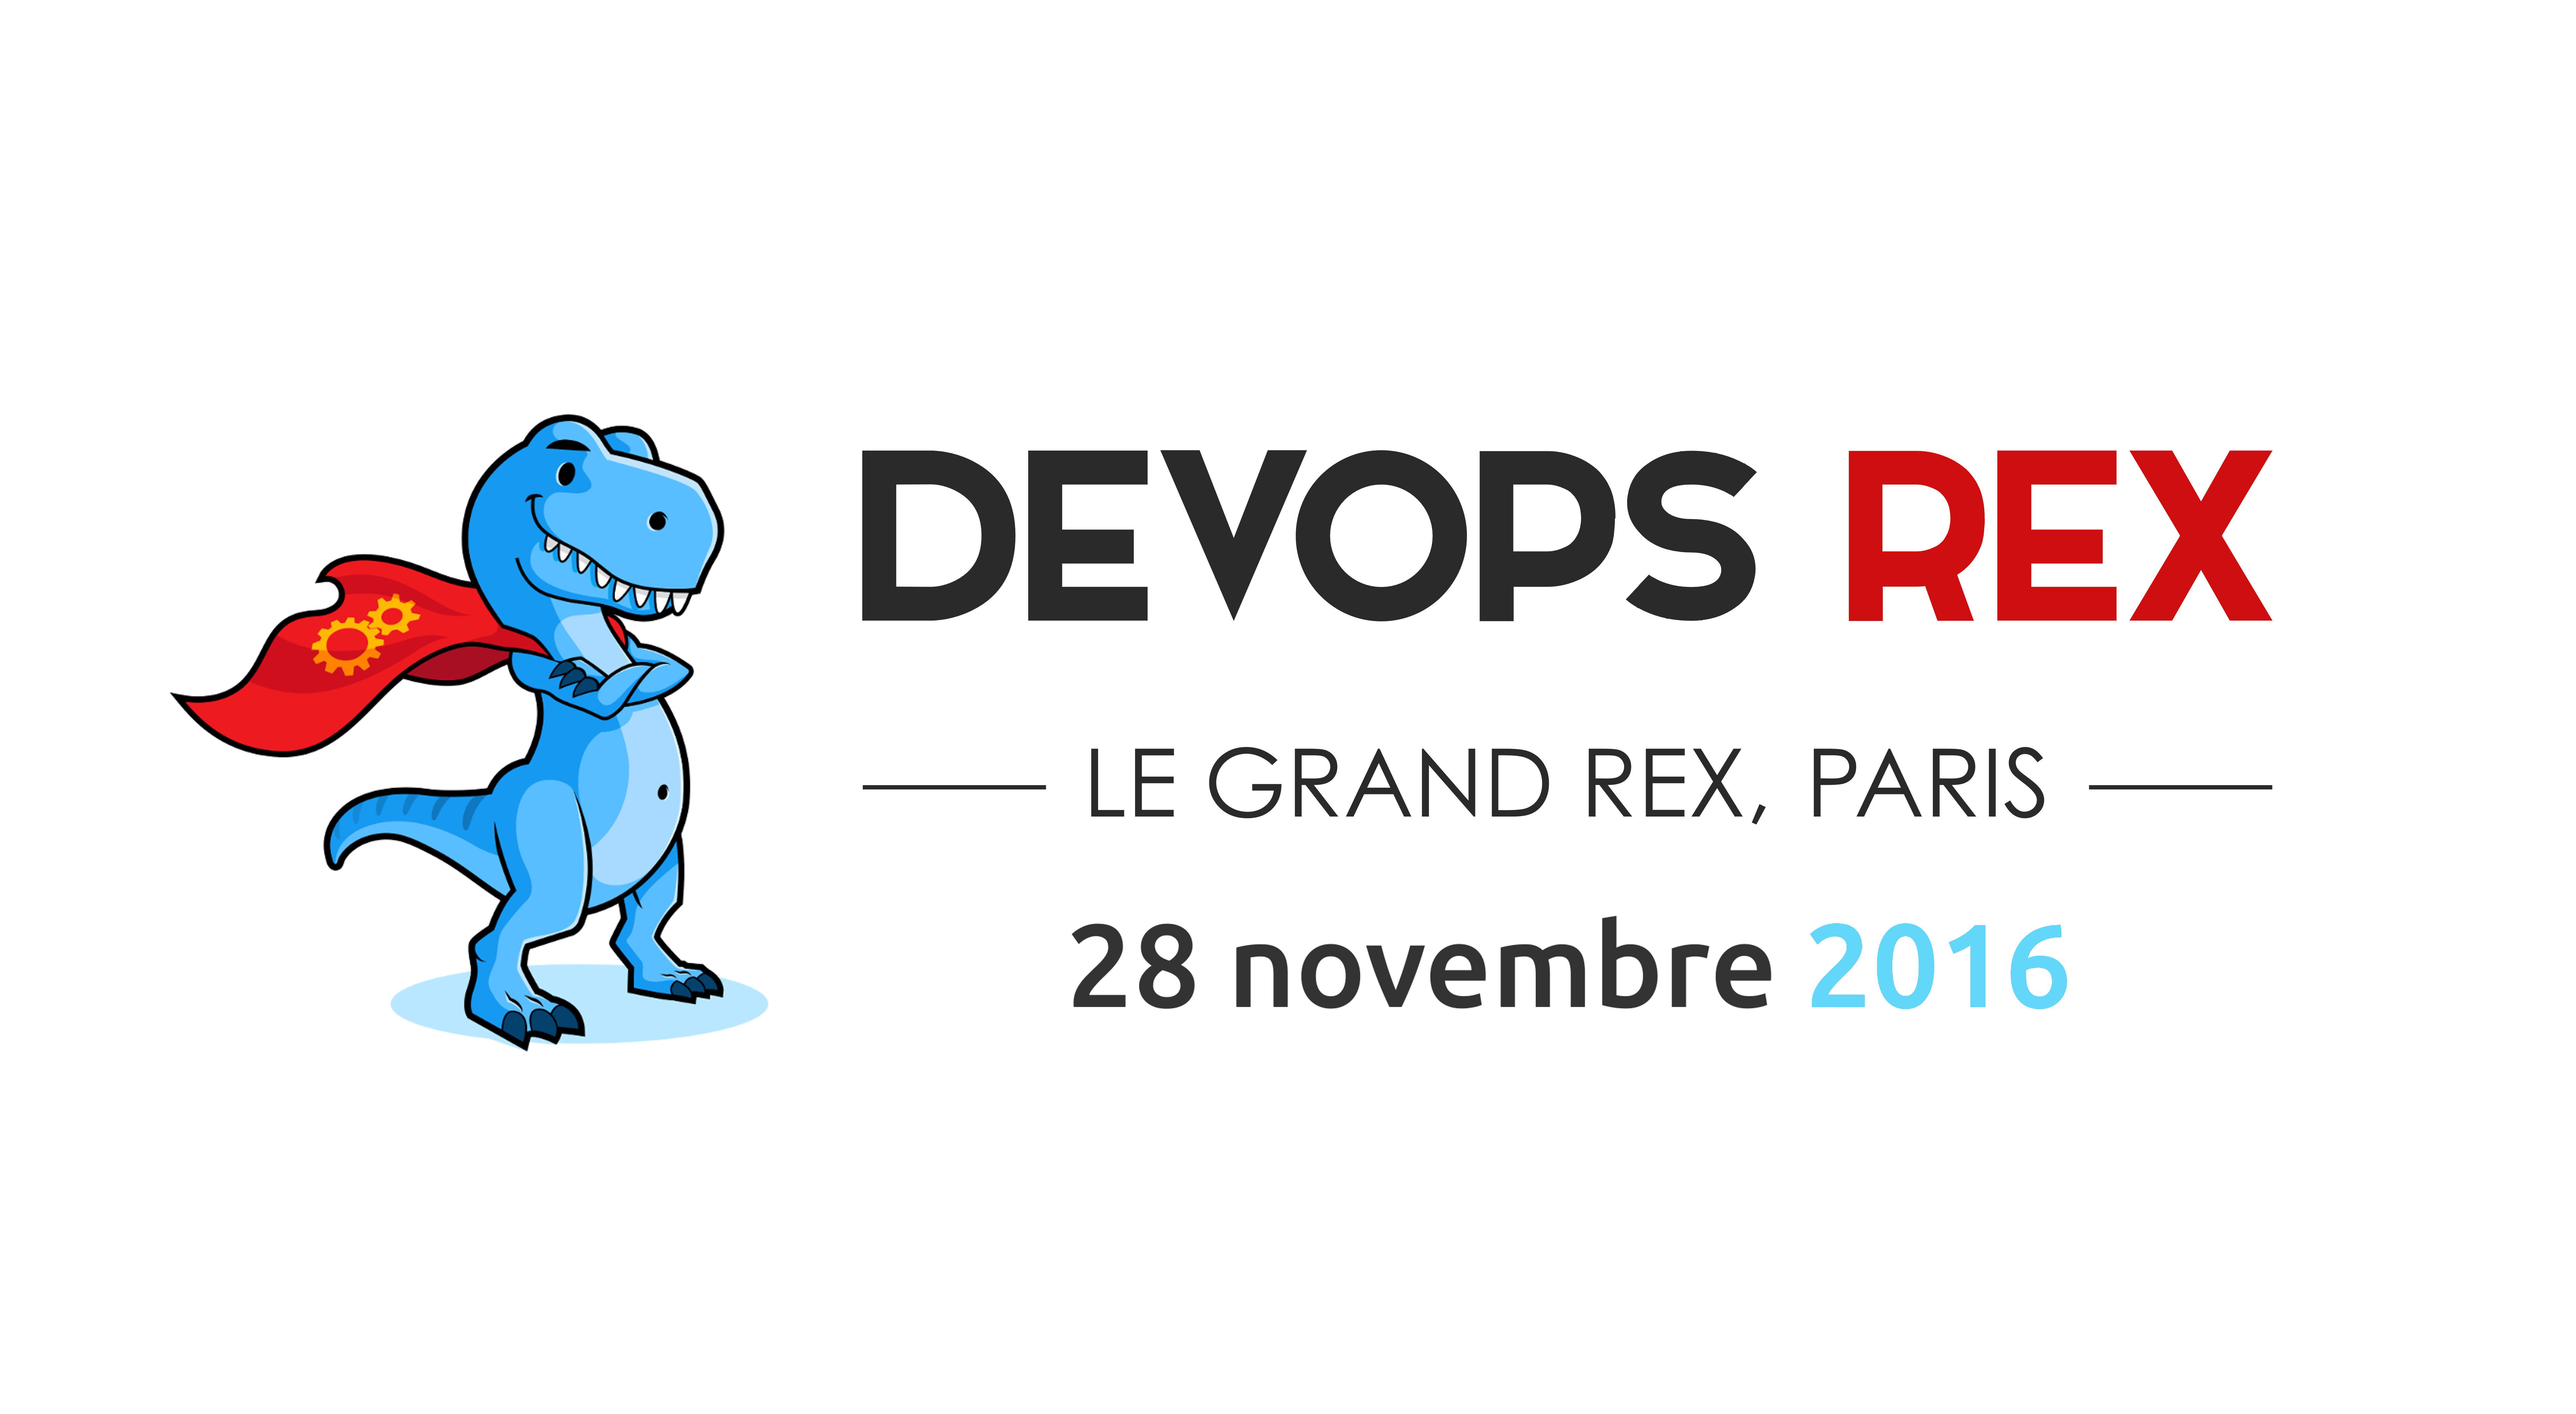 devops REX 28 novembre 2016